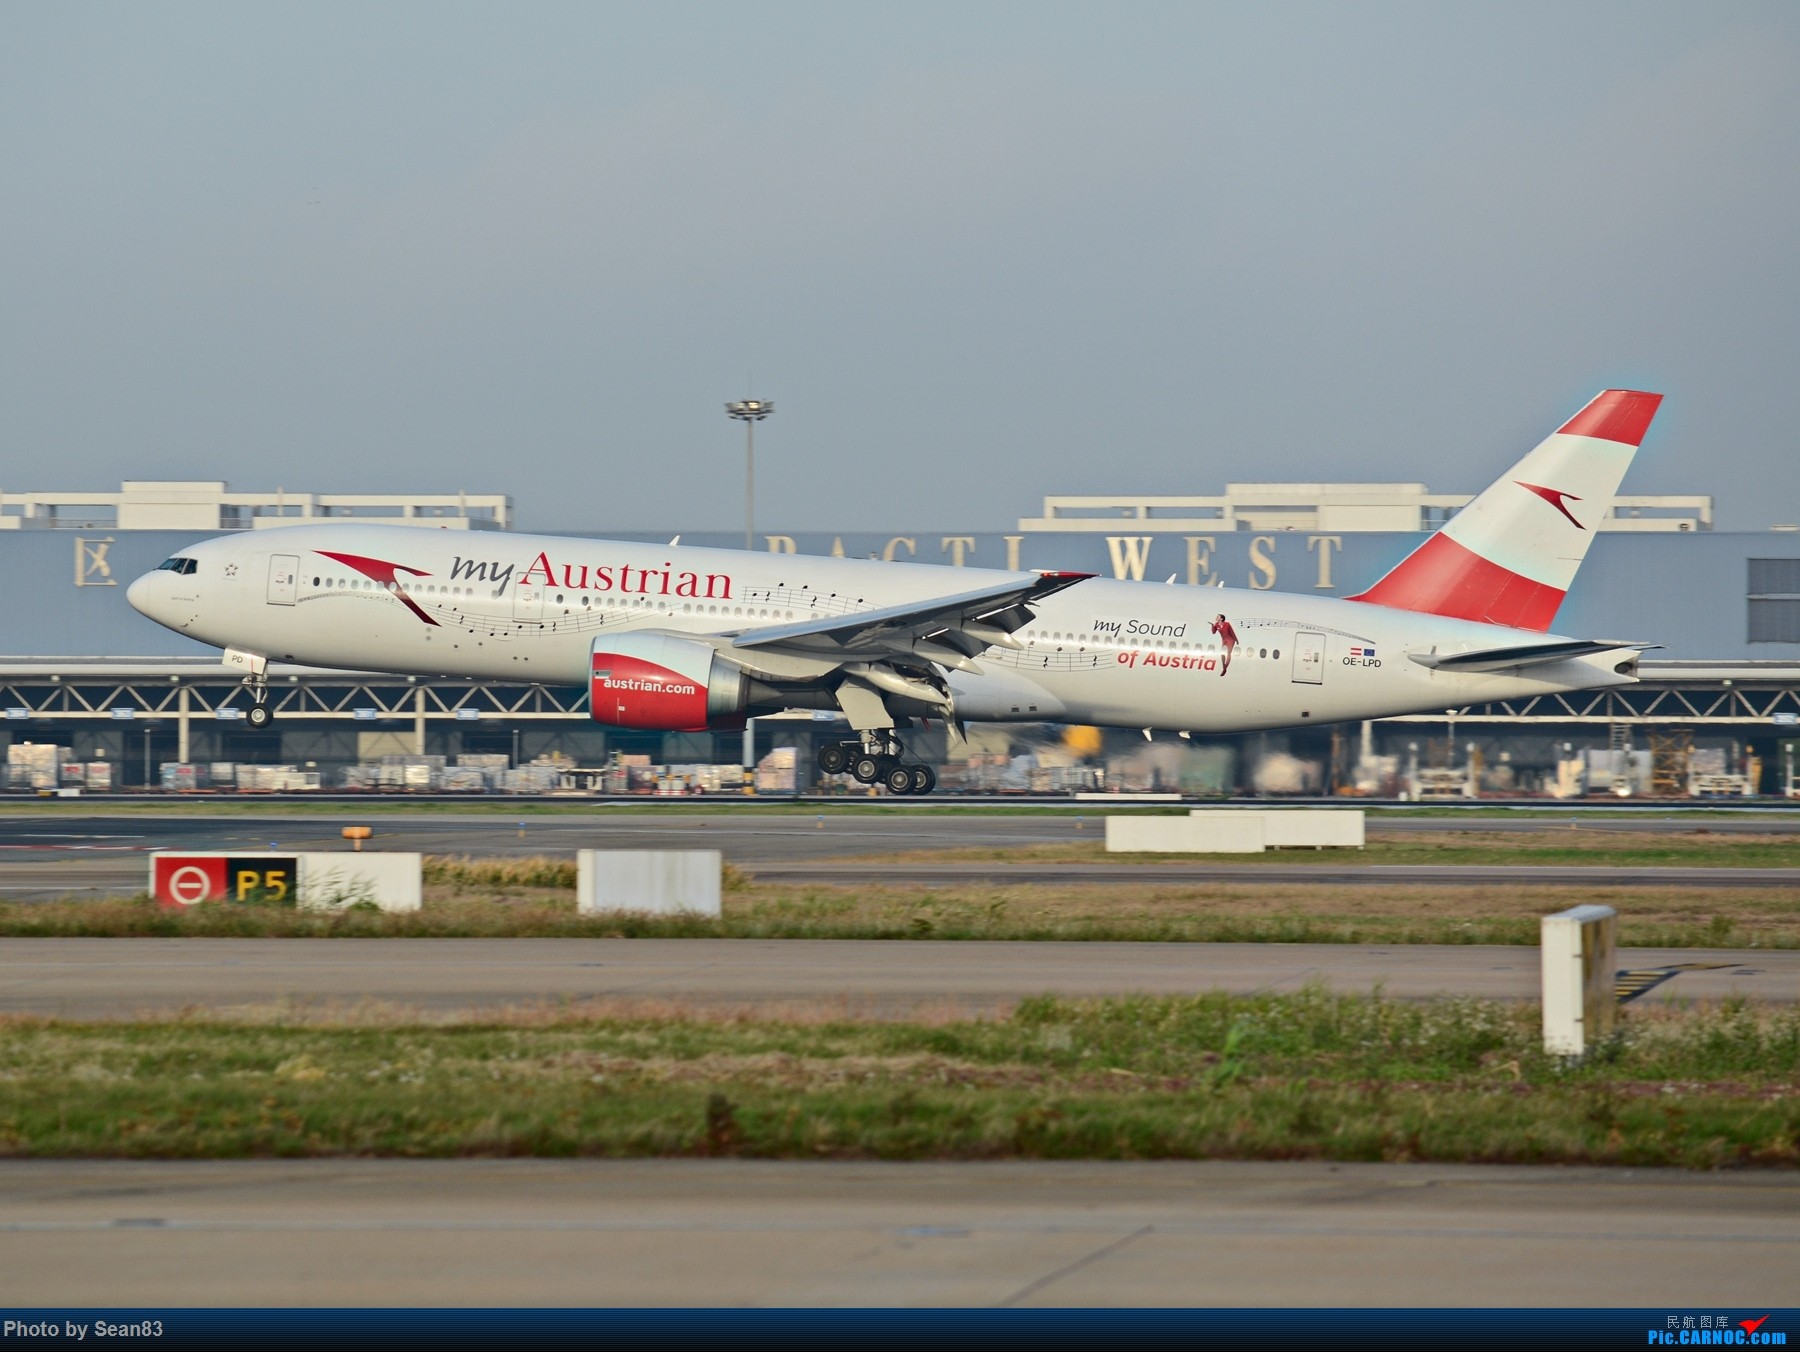 Re:[原创](PVG1080*) 奥地利 蓝色多瑙河 彩绘降落 BOEING 777-200ER OE-LPD 上海浦东国际机场